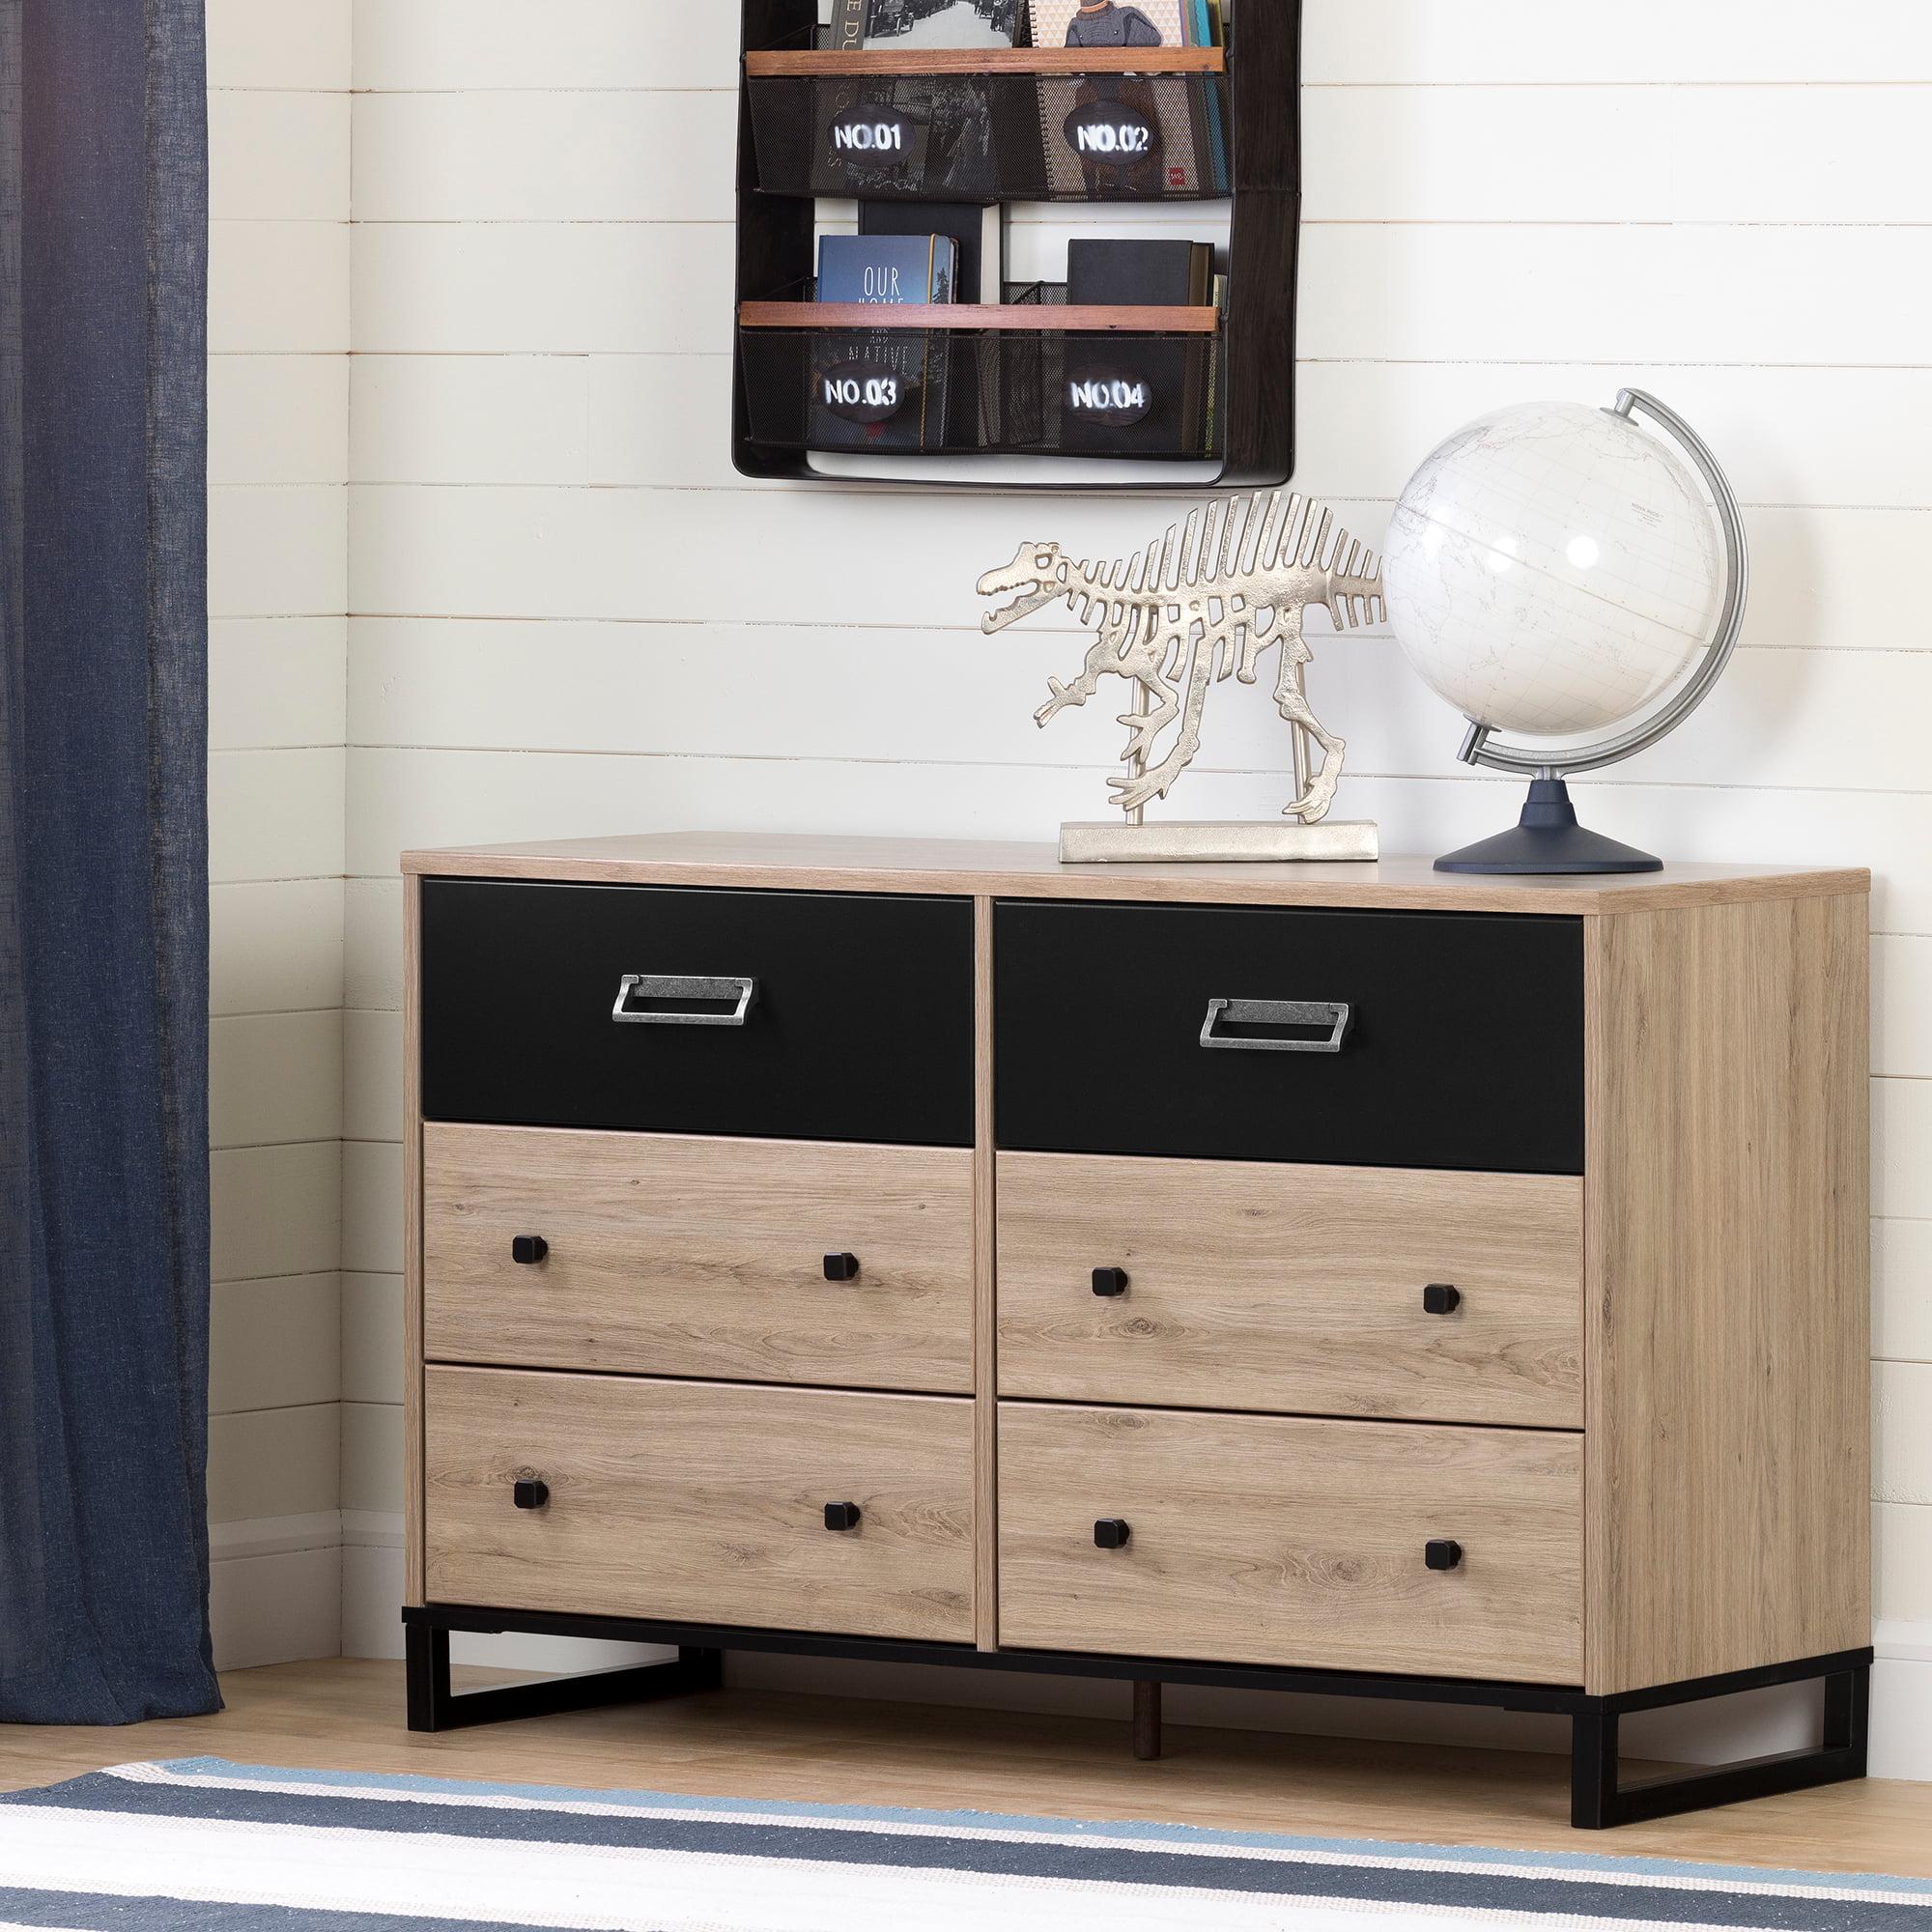 South Shore Induzy 6-Drawer Double Dresser, Rustic Oak and Matte Black